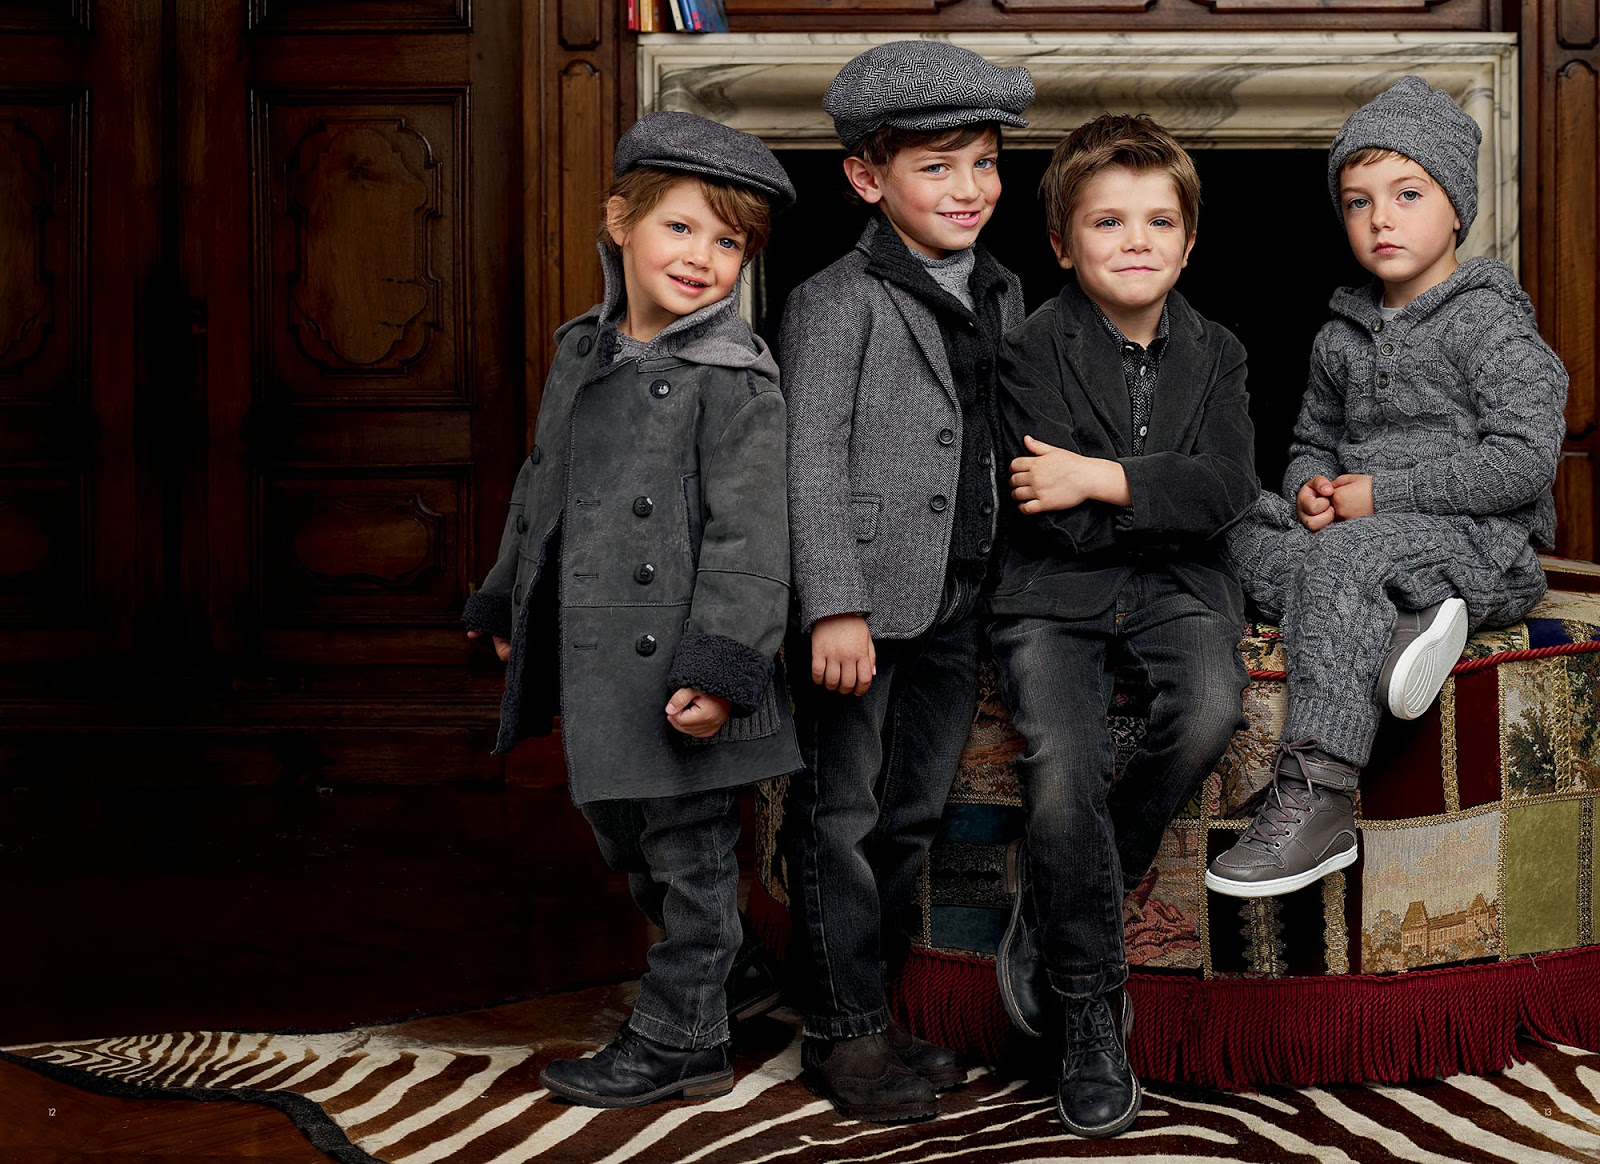 dolcegabbana-dg-fall-winter-2013-full-print-ad-campaign-child-designer-childrenswear-kidswear-baby-newborn-fashion-photography-giampaolosgura-03